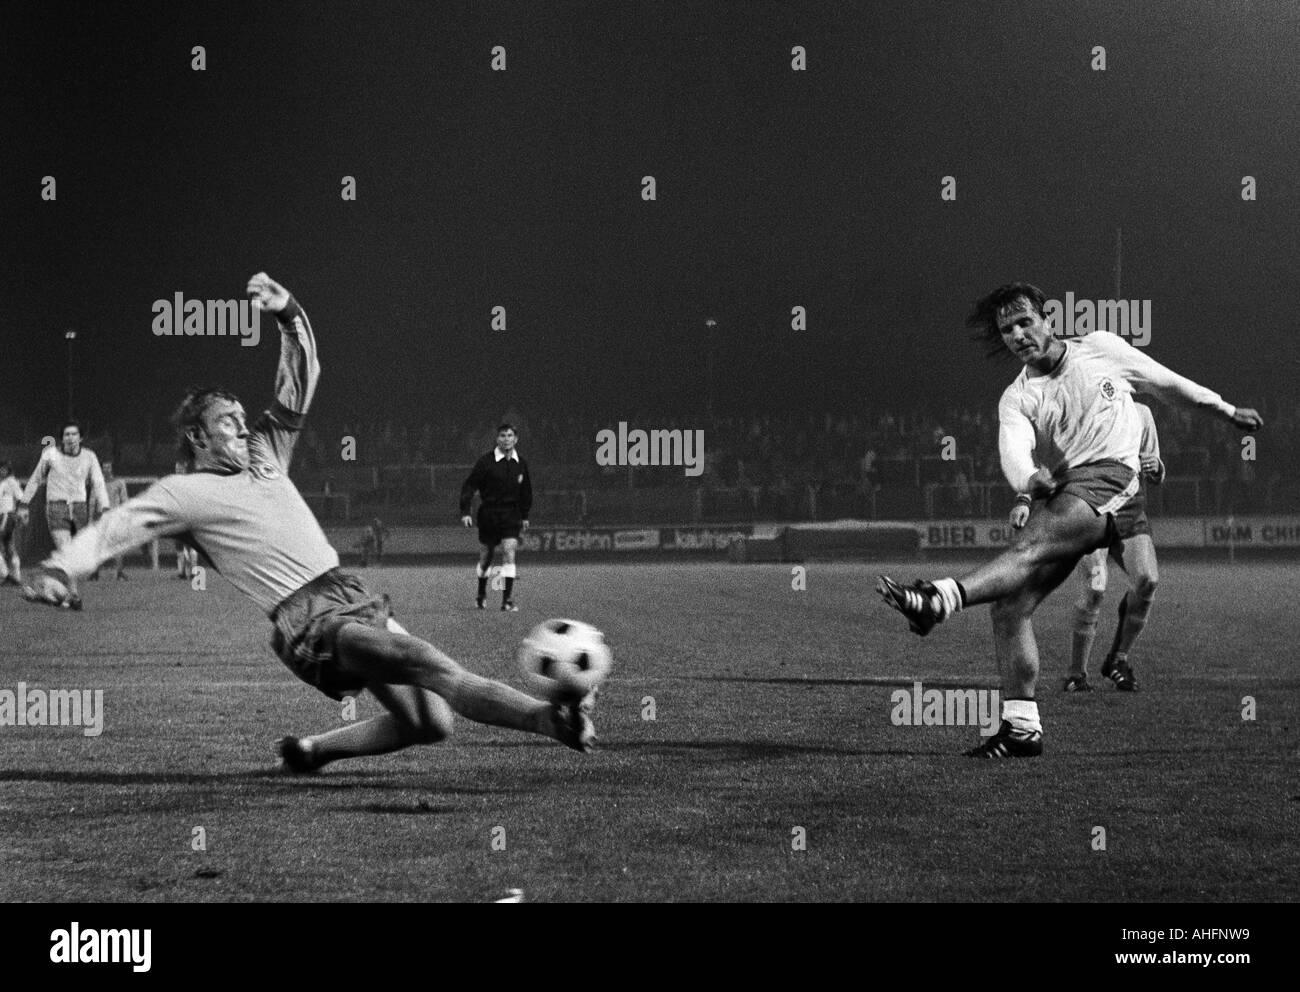 football, Bundesliga, 1972/1973, Rot-Weiss Oberhausen versus Eintracht Brunswick 0:1, Niederrhein Stadium in Oberhausen, scene of the match, shot on goal by Herbert Liedtke (RWO) right, left Peter Kaack (BS) - Stock Image